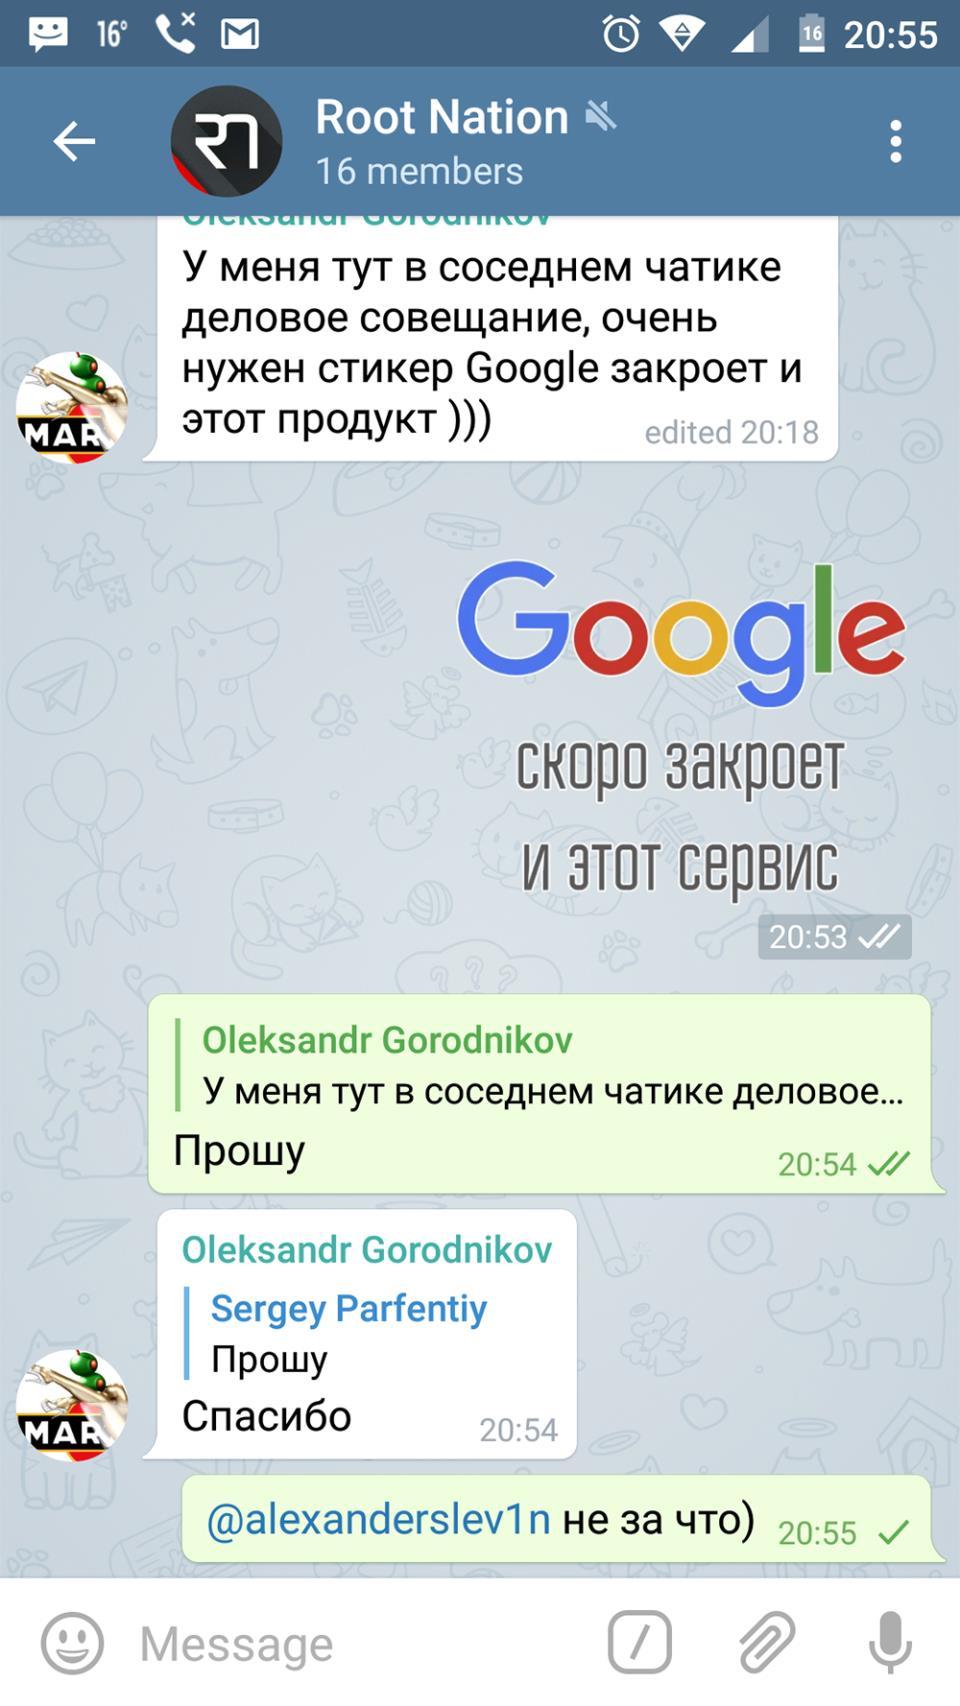 Screenshot_2016-06-01-20-55-42